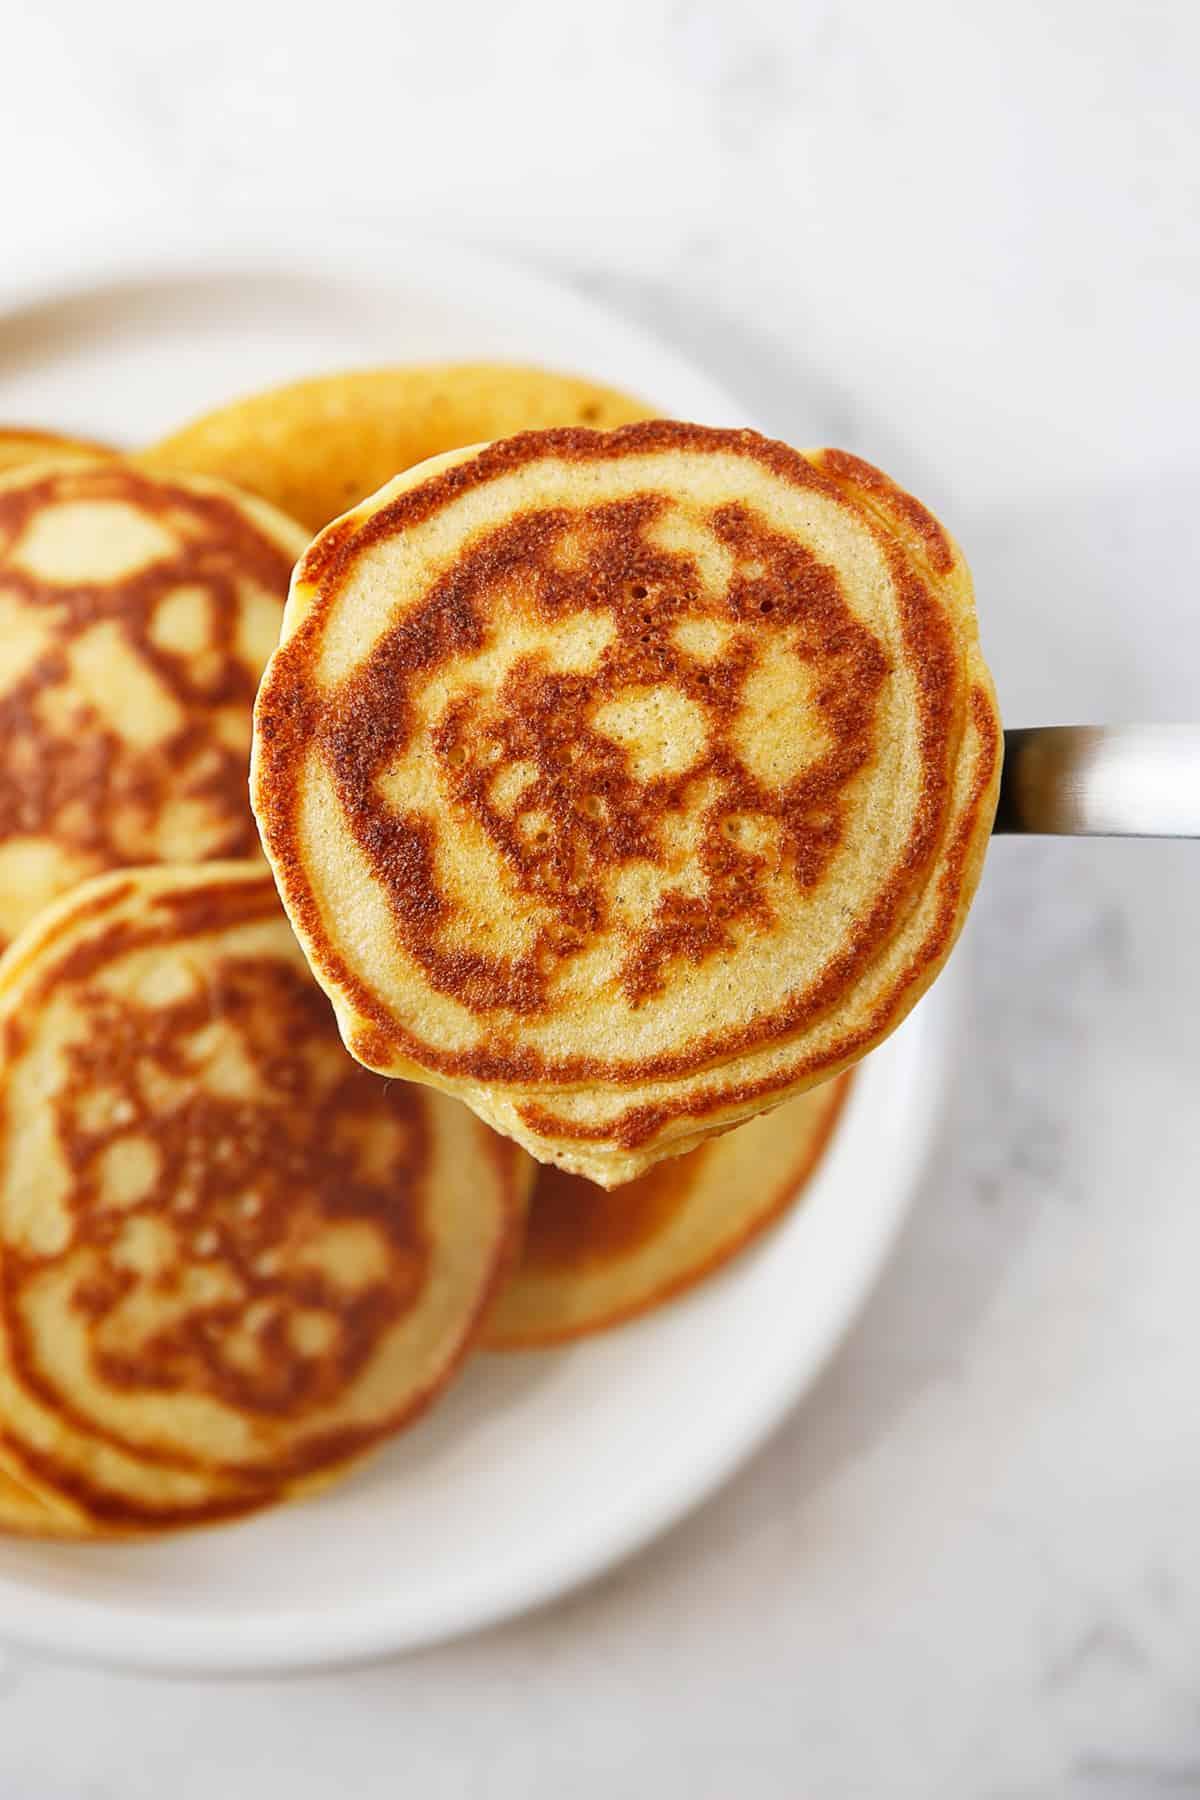 Tapioca flour pancakes on a plate.